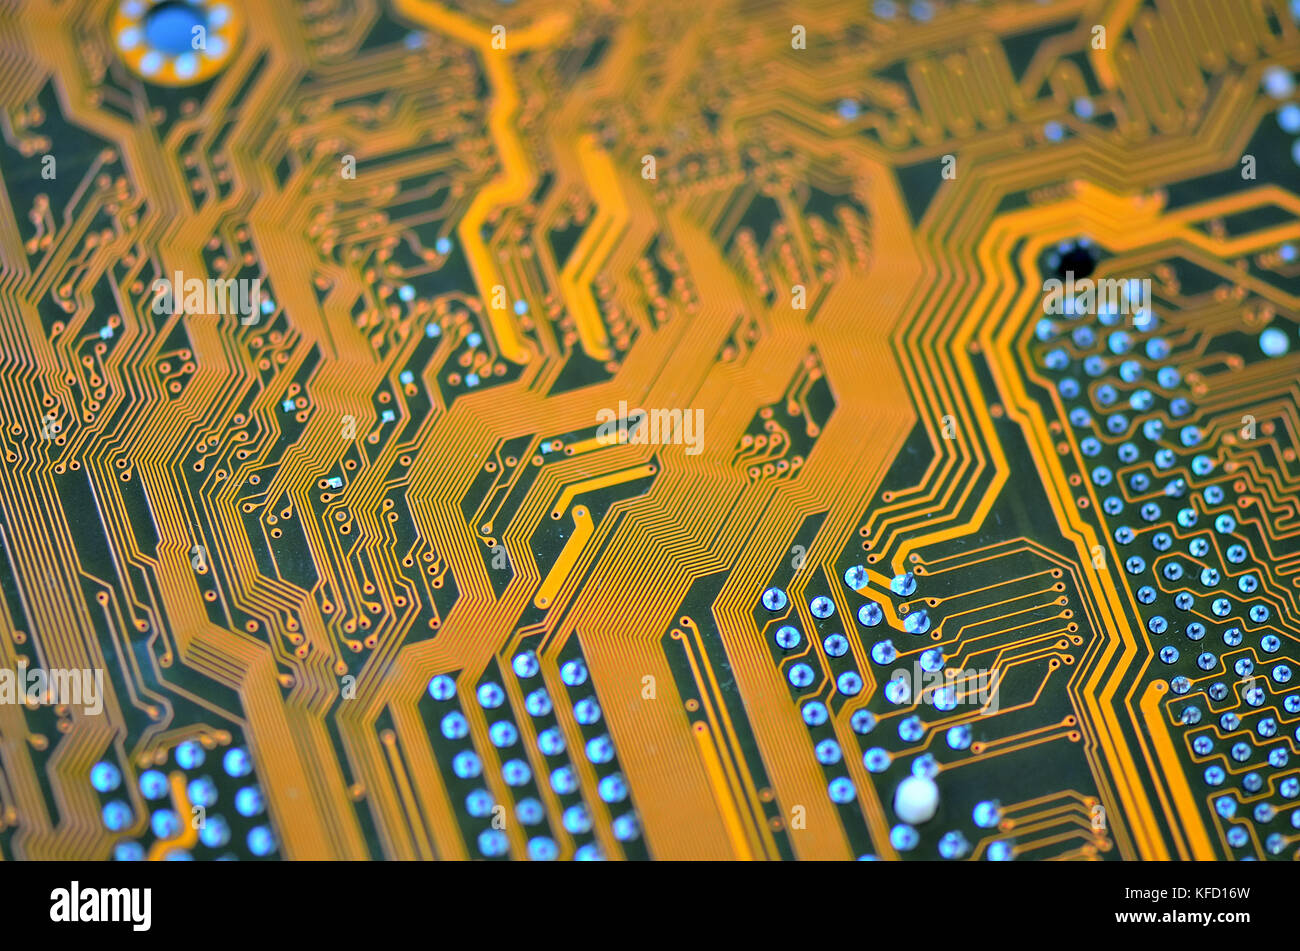 Computer hardware. Closeup electronic circuit board background. Selective Focus. - Stock Image